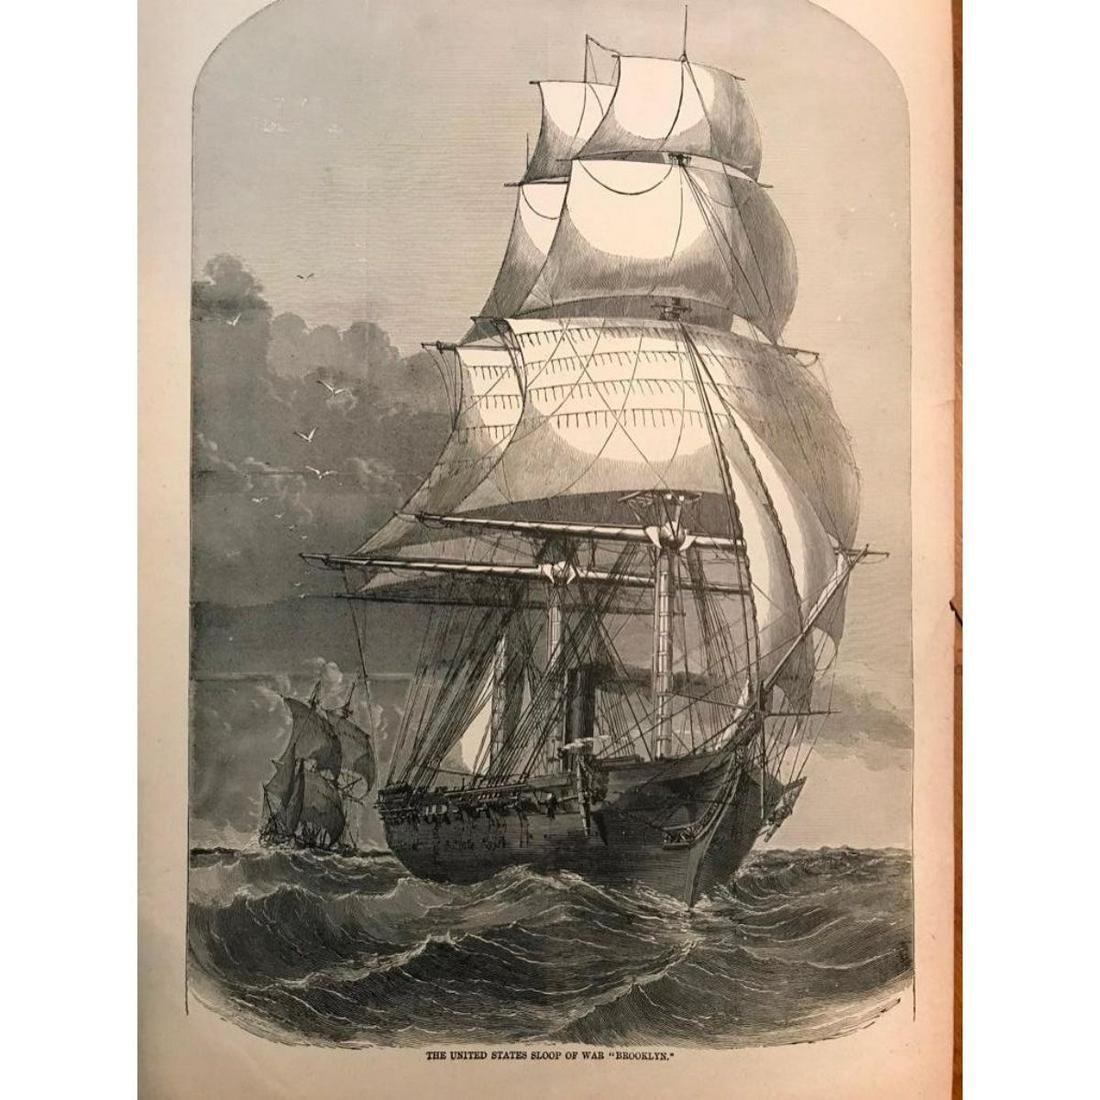 19thc Wood Cut Engraving, Sailing Vessel, War Ship